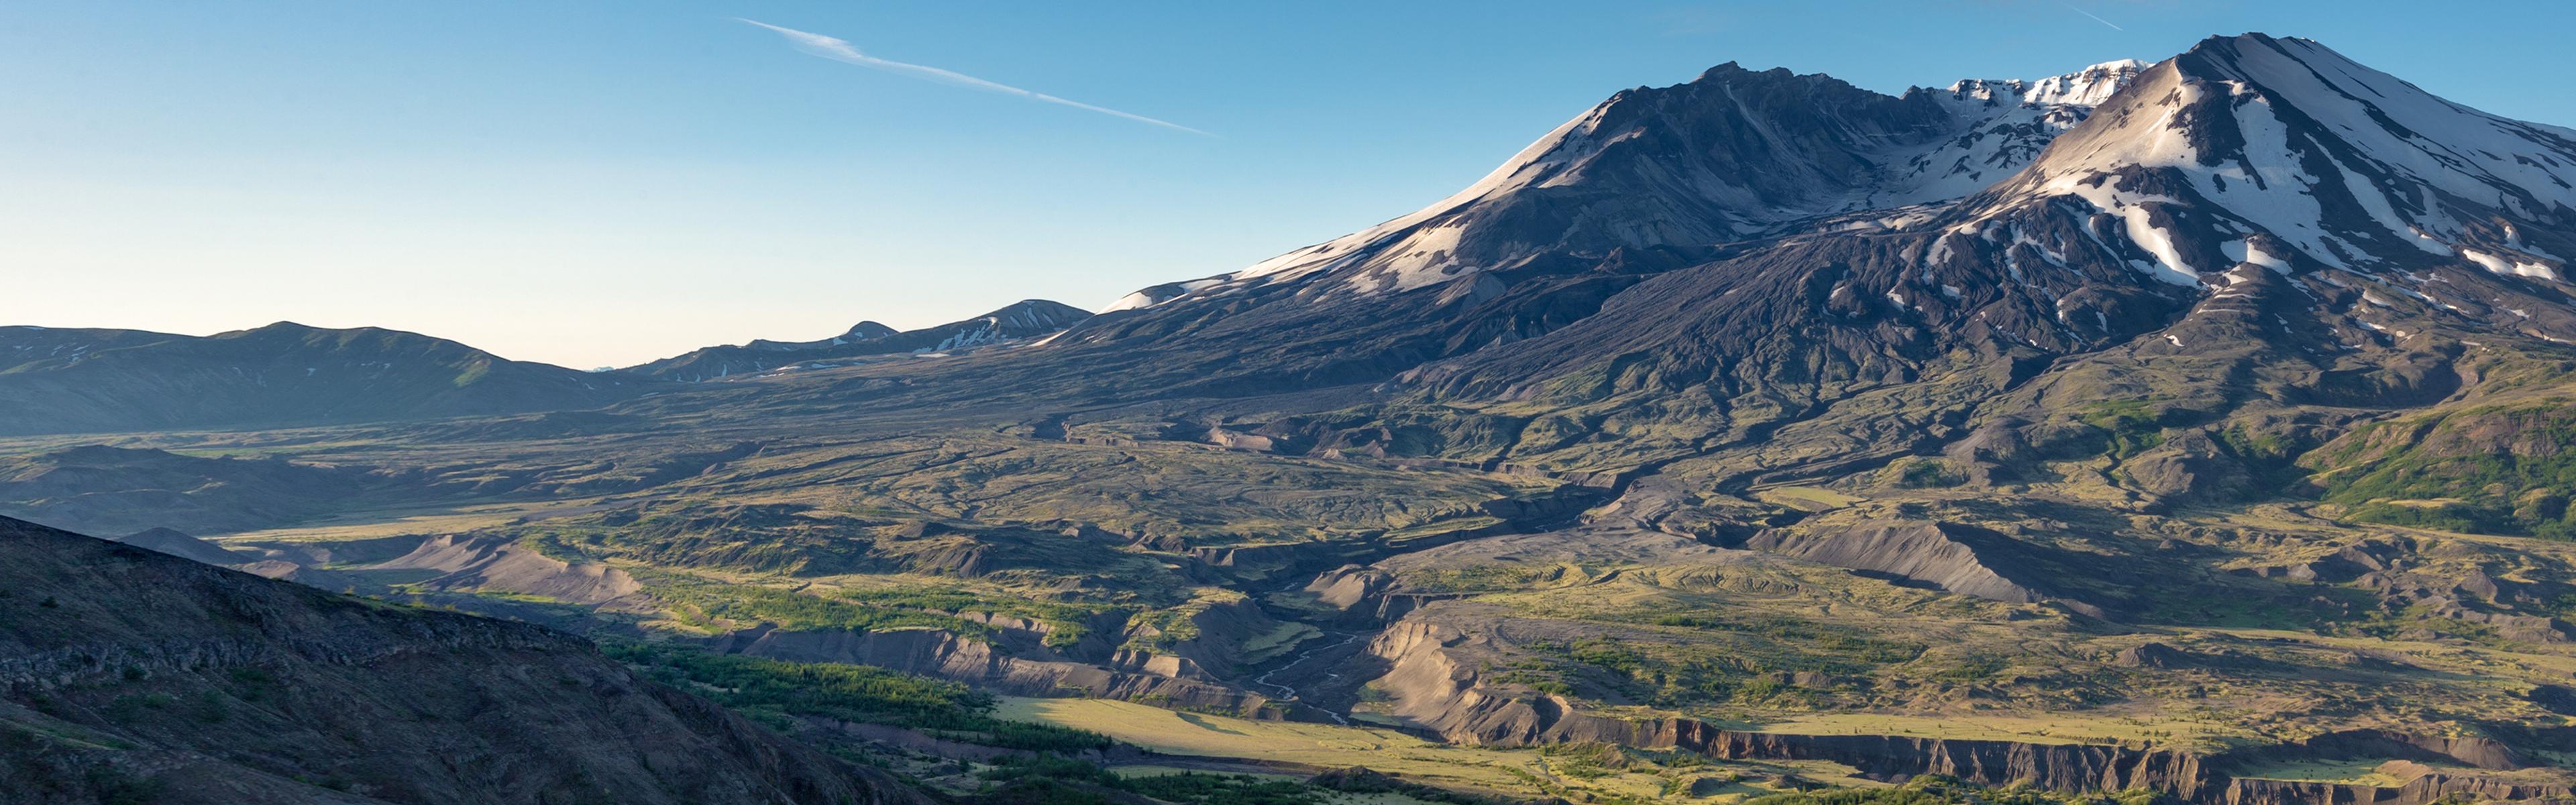 Mt St Helens Wallpapers   Album on Imgur 3840x1200